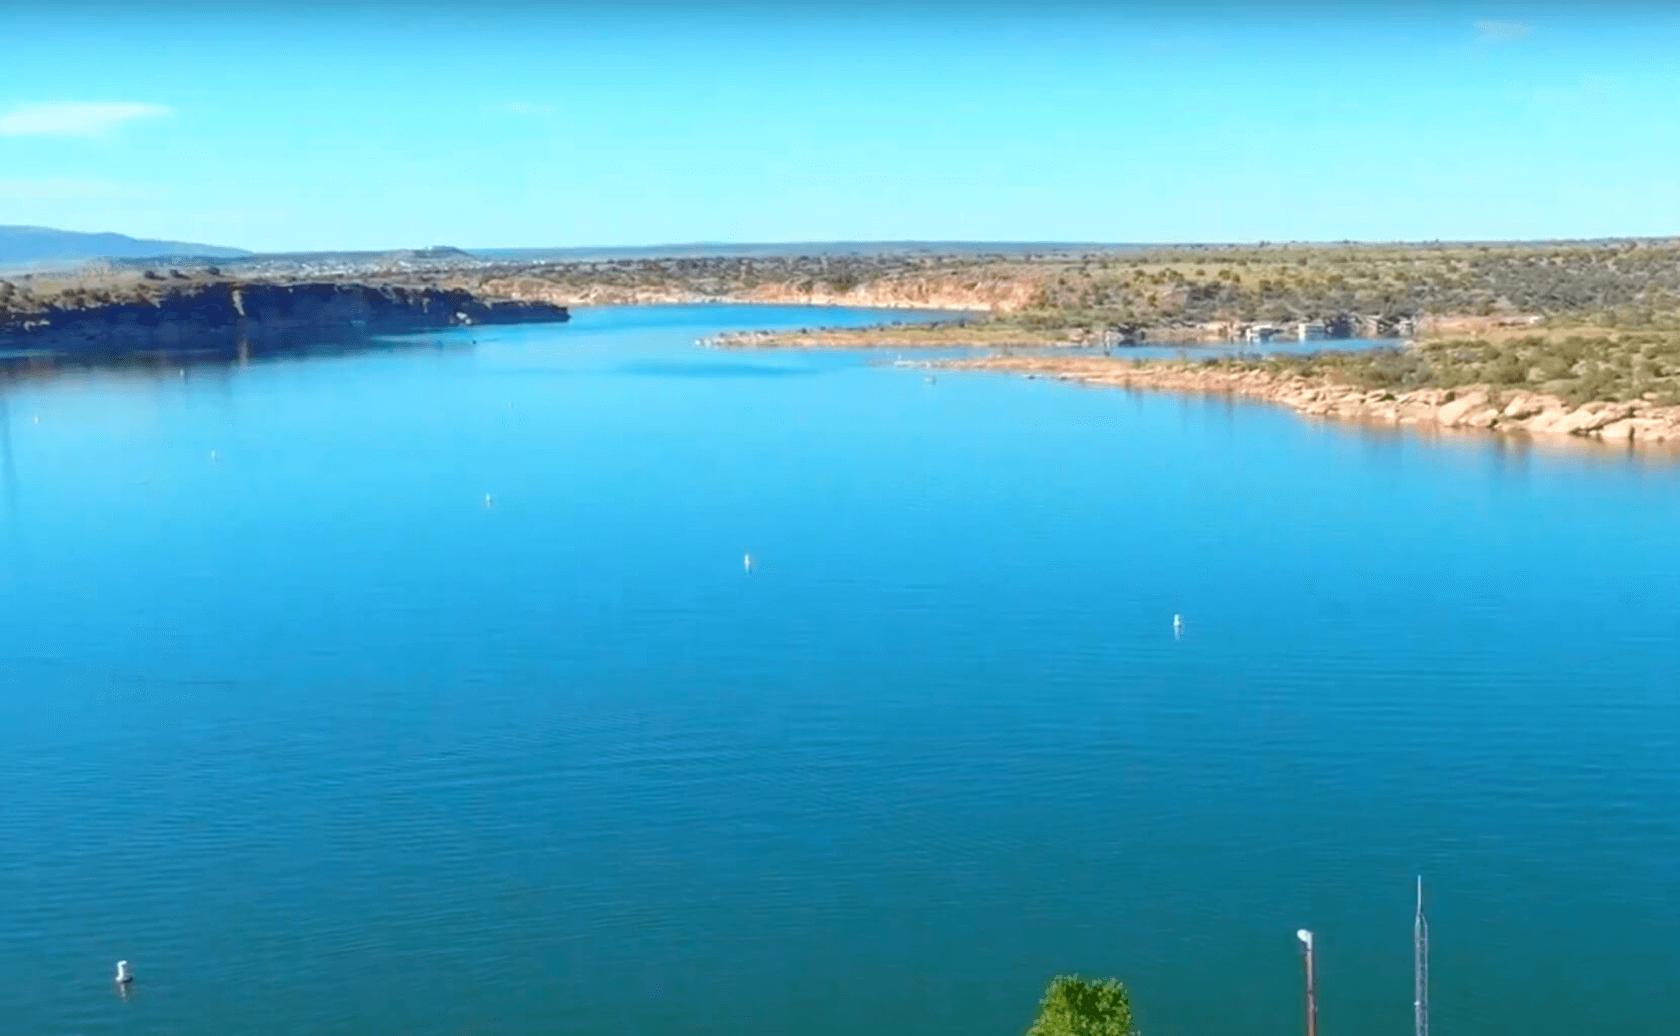 Conchas-Lake-Fishing-Guide-04-1